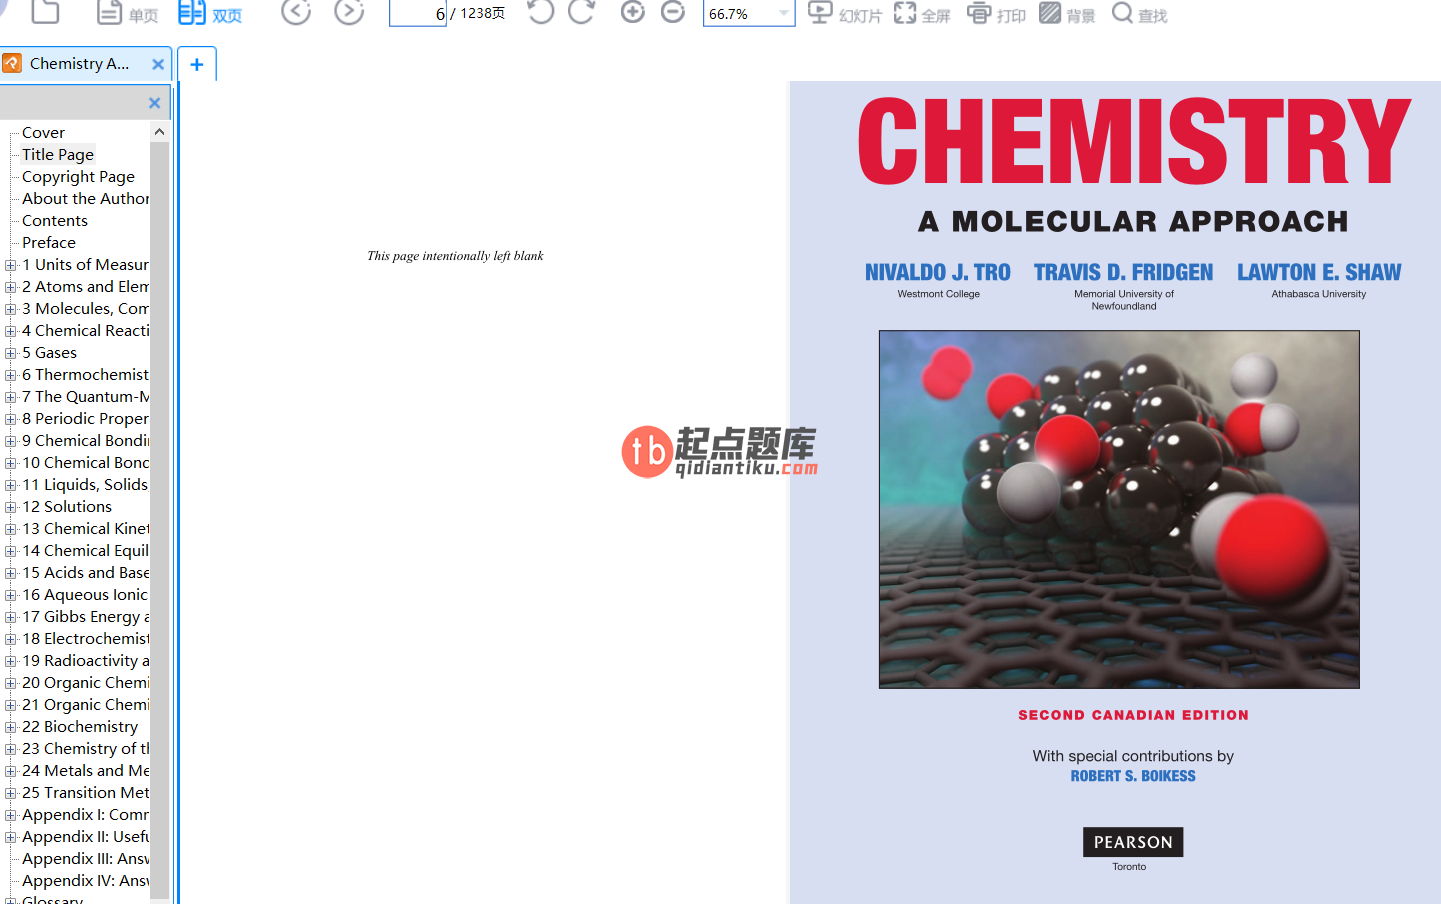 Chemistry: A Molecular Approach 2nd Canadian Edition的图片 2